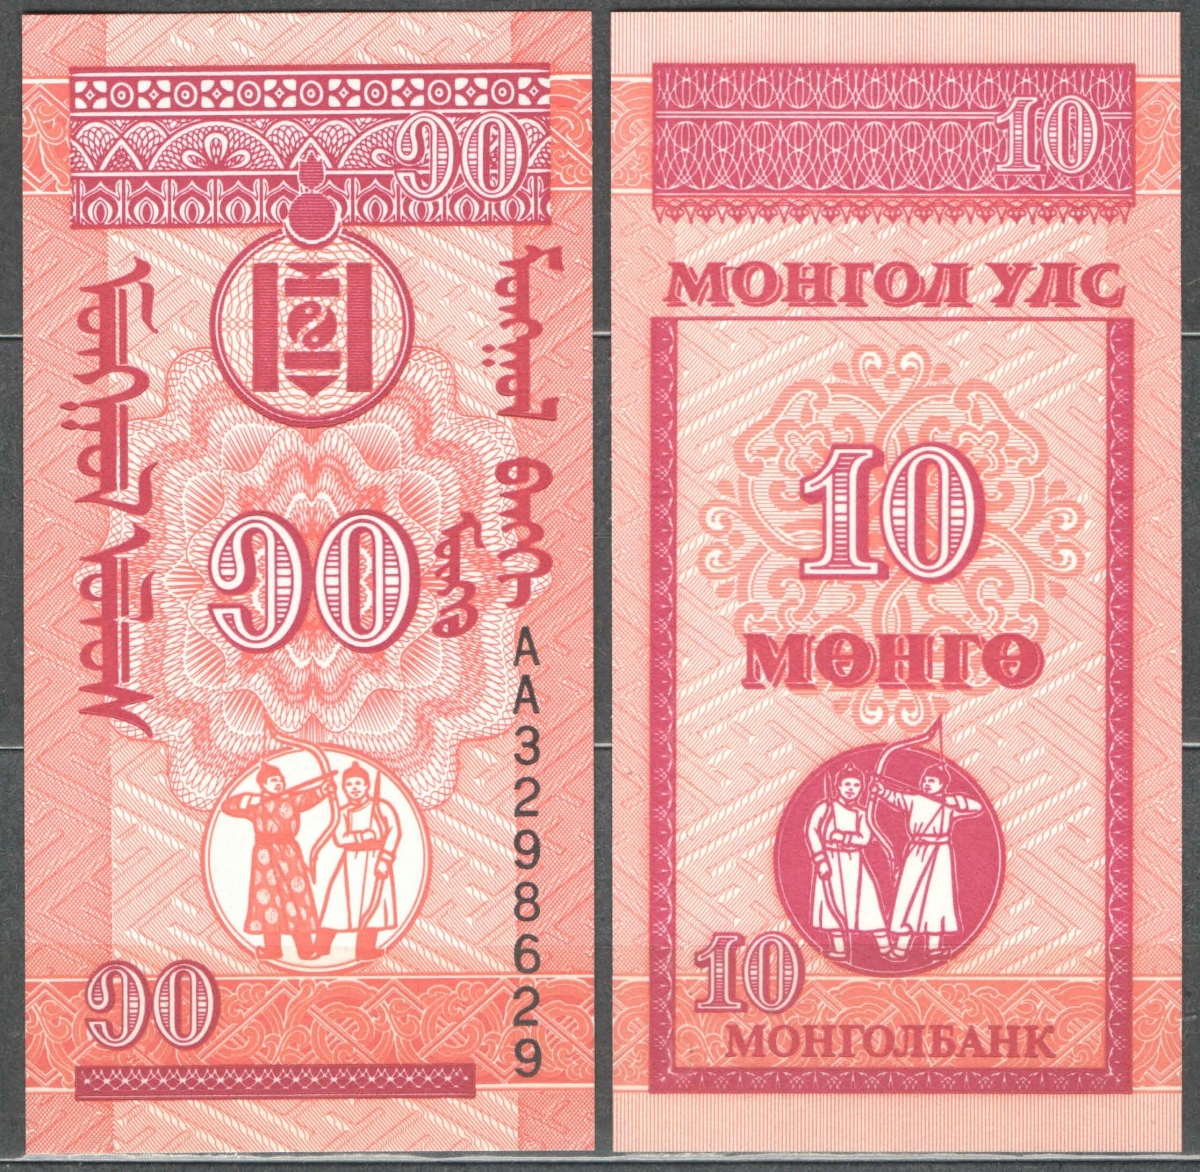 Mongolia - P- 49 - 10 mongo - 1993 - seria AA